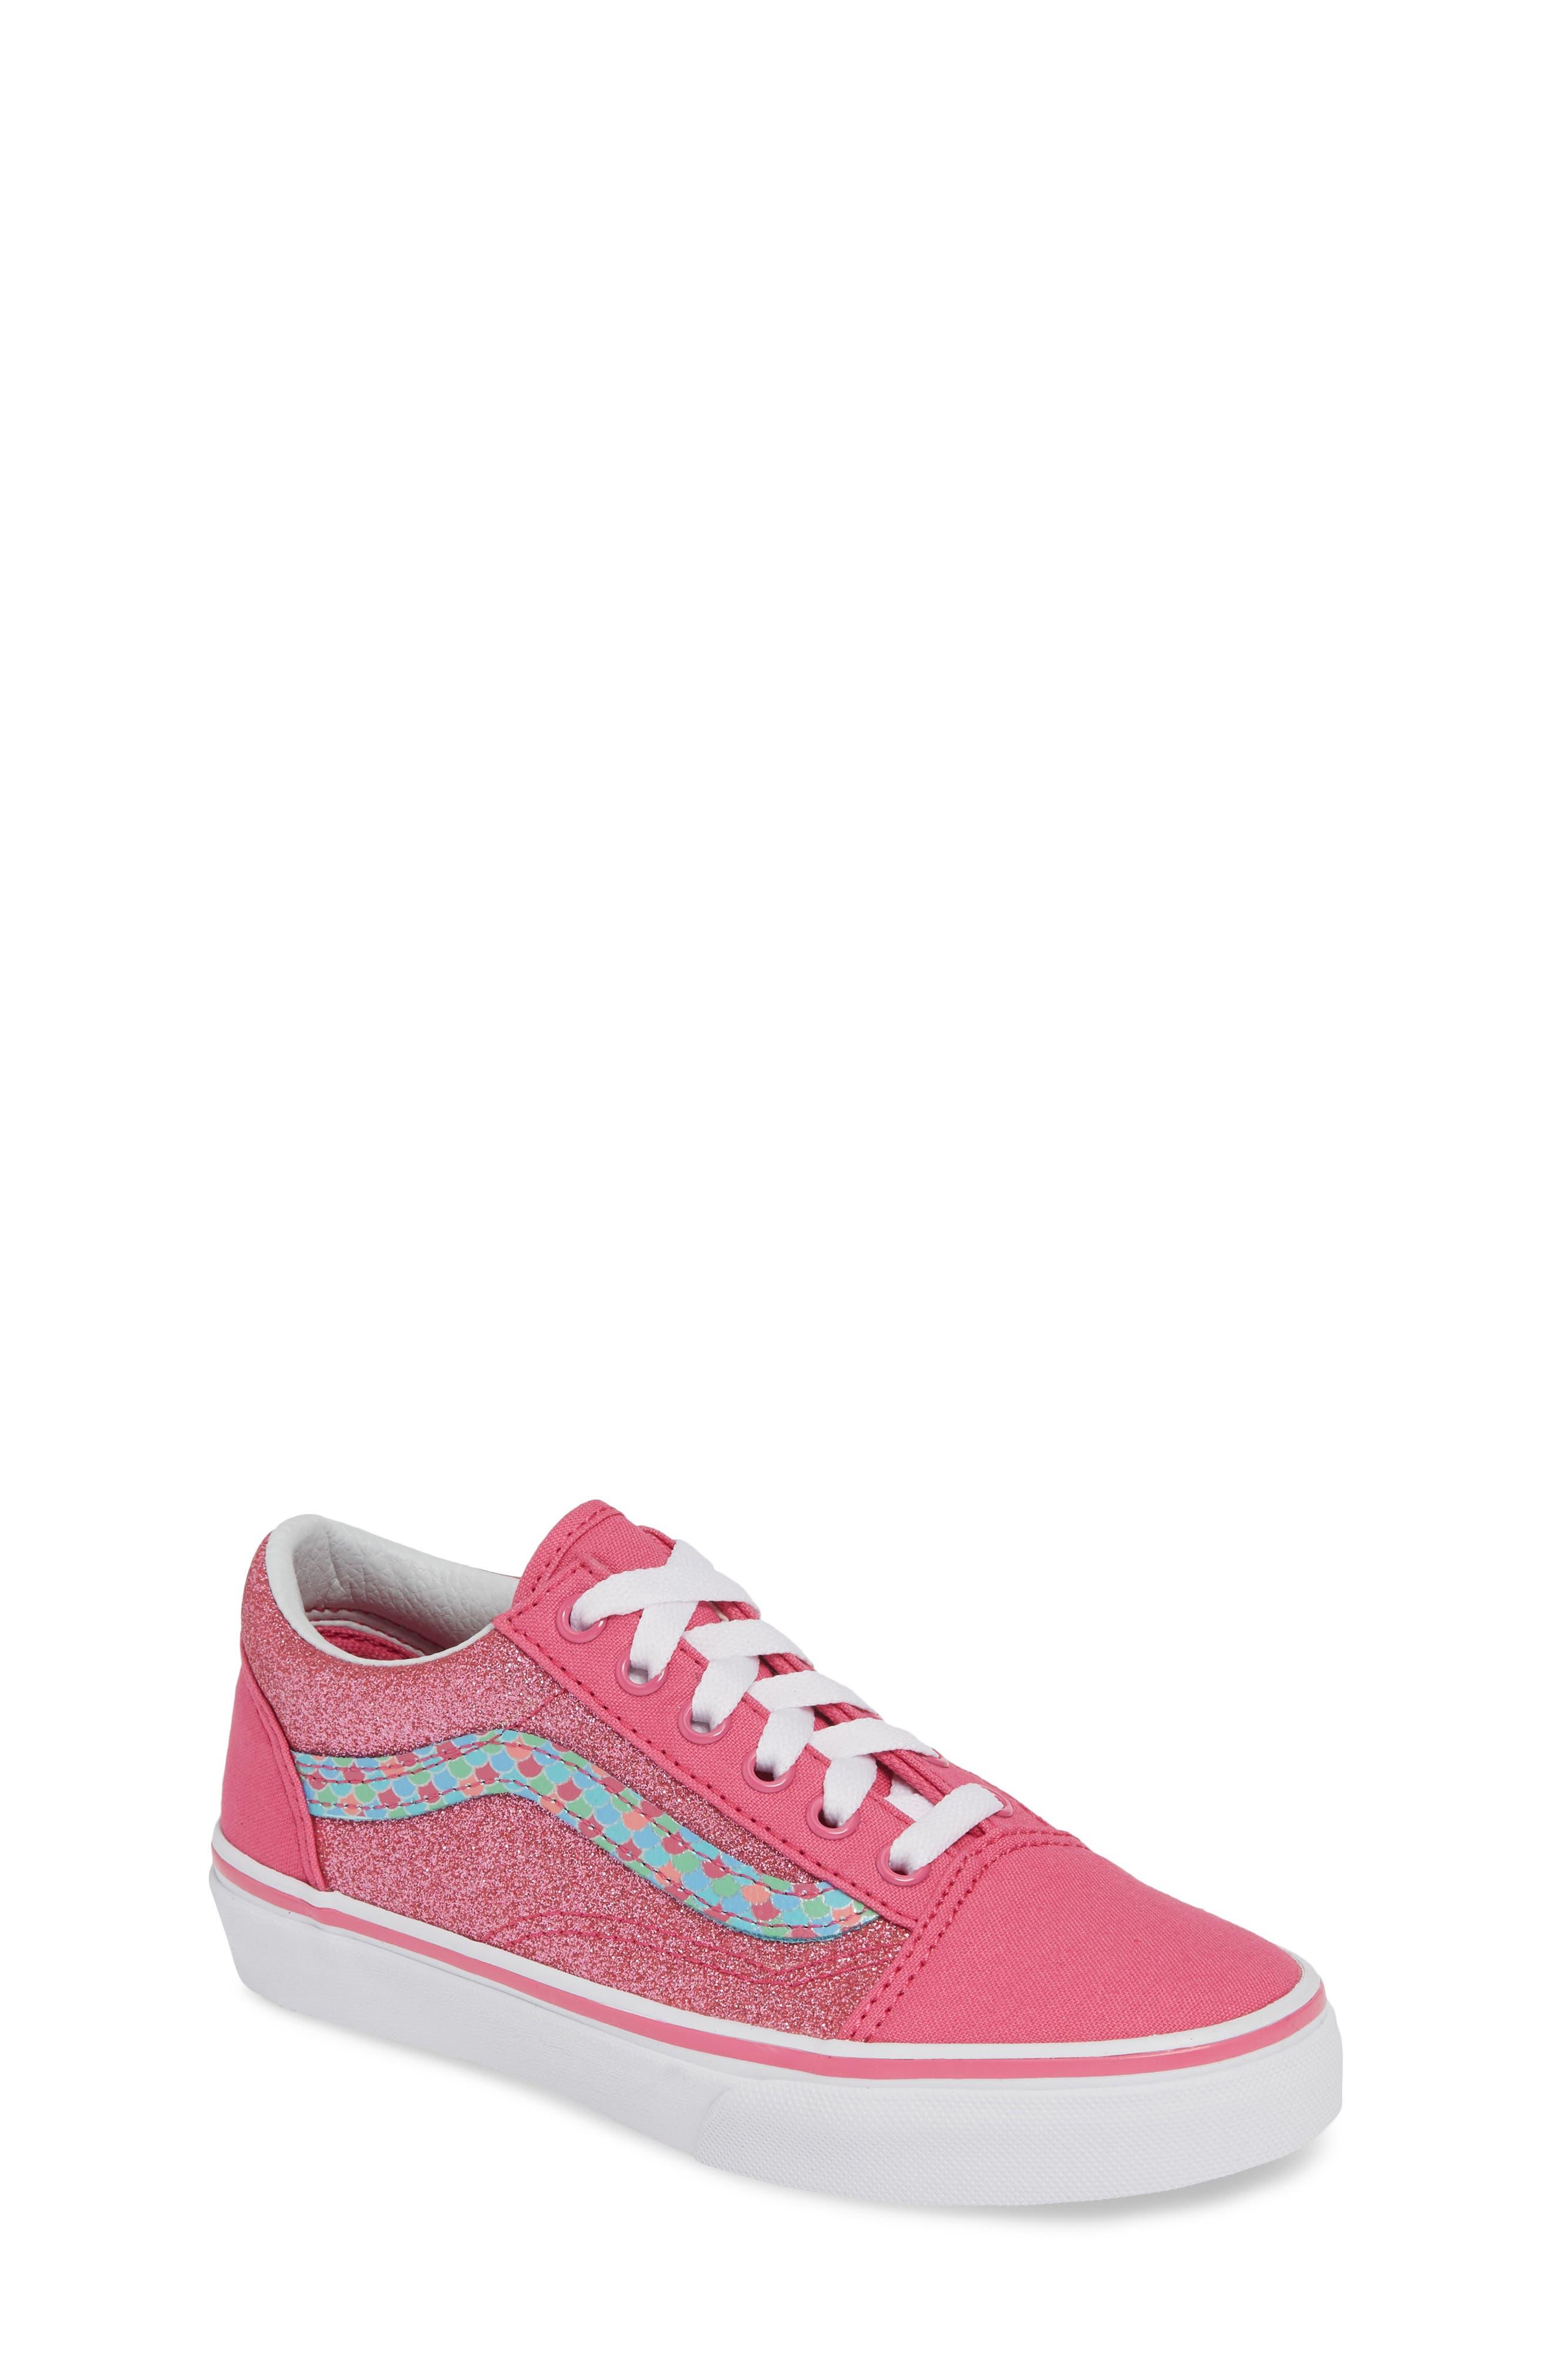 VANS Old Skool Sneaker, Main, color, CARMINE ROSE/ TRUE WHITE